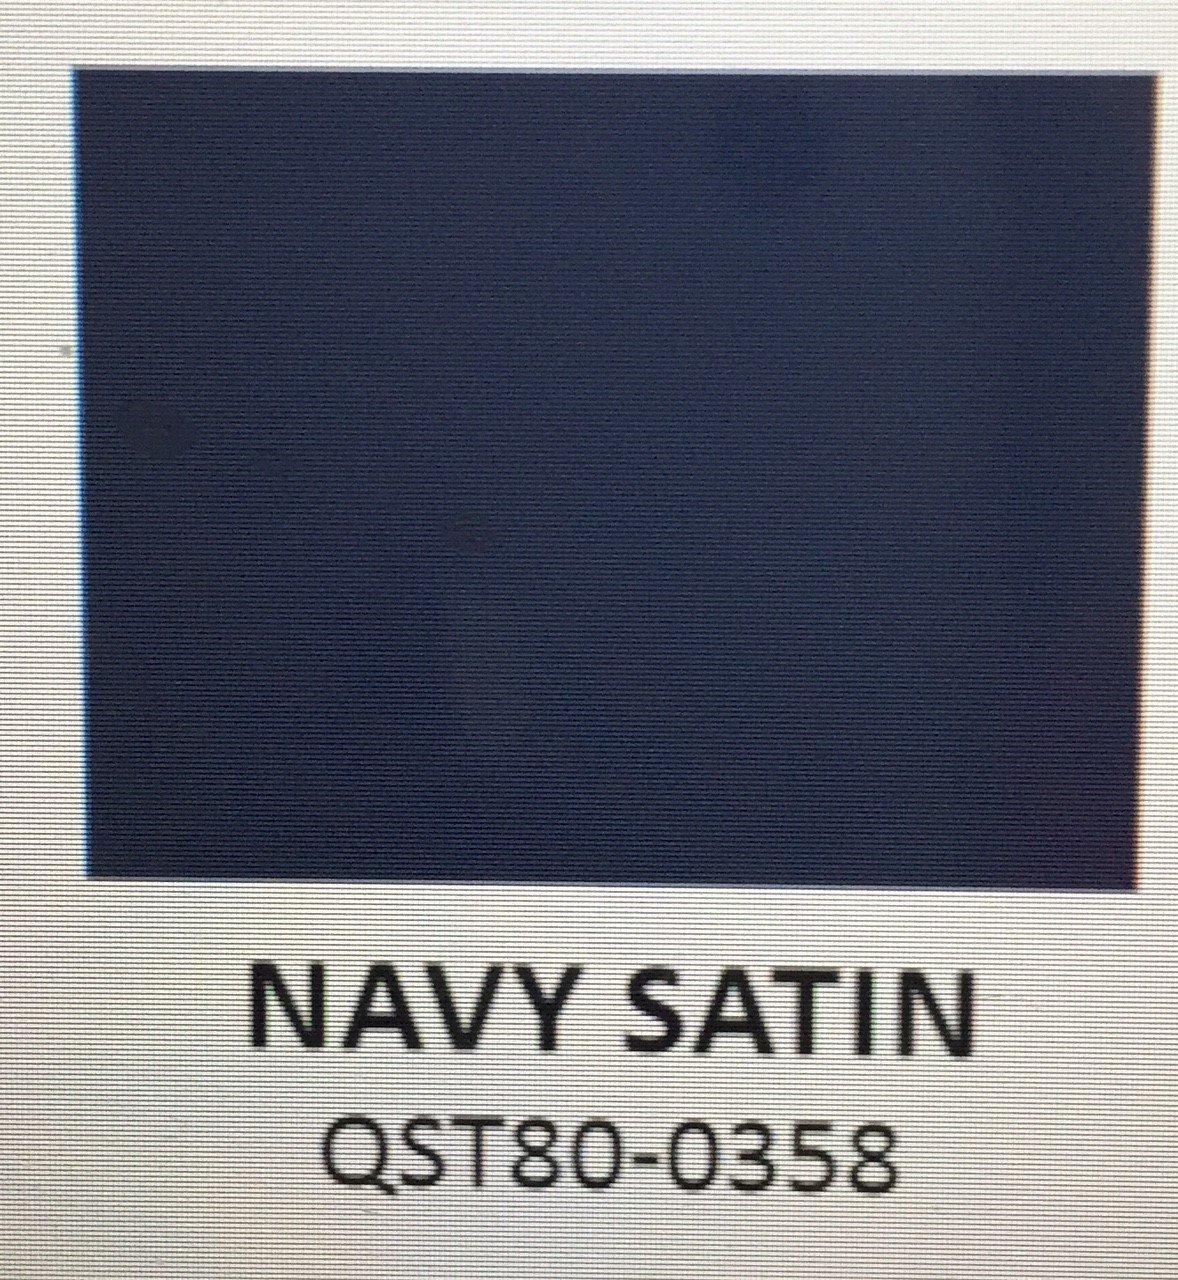 Quilters Select 80wt Para Cot/Poly - Navy Satin